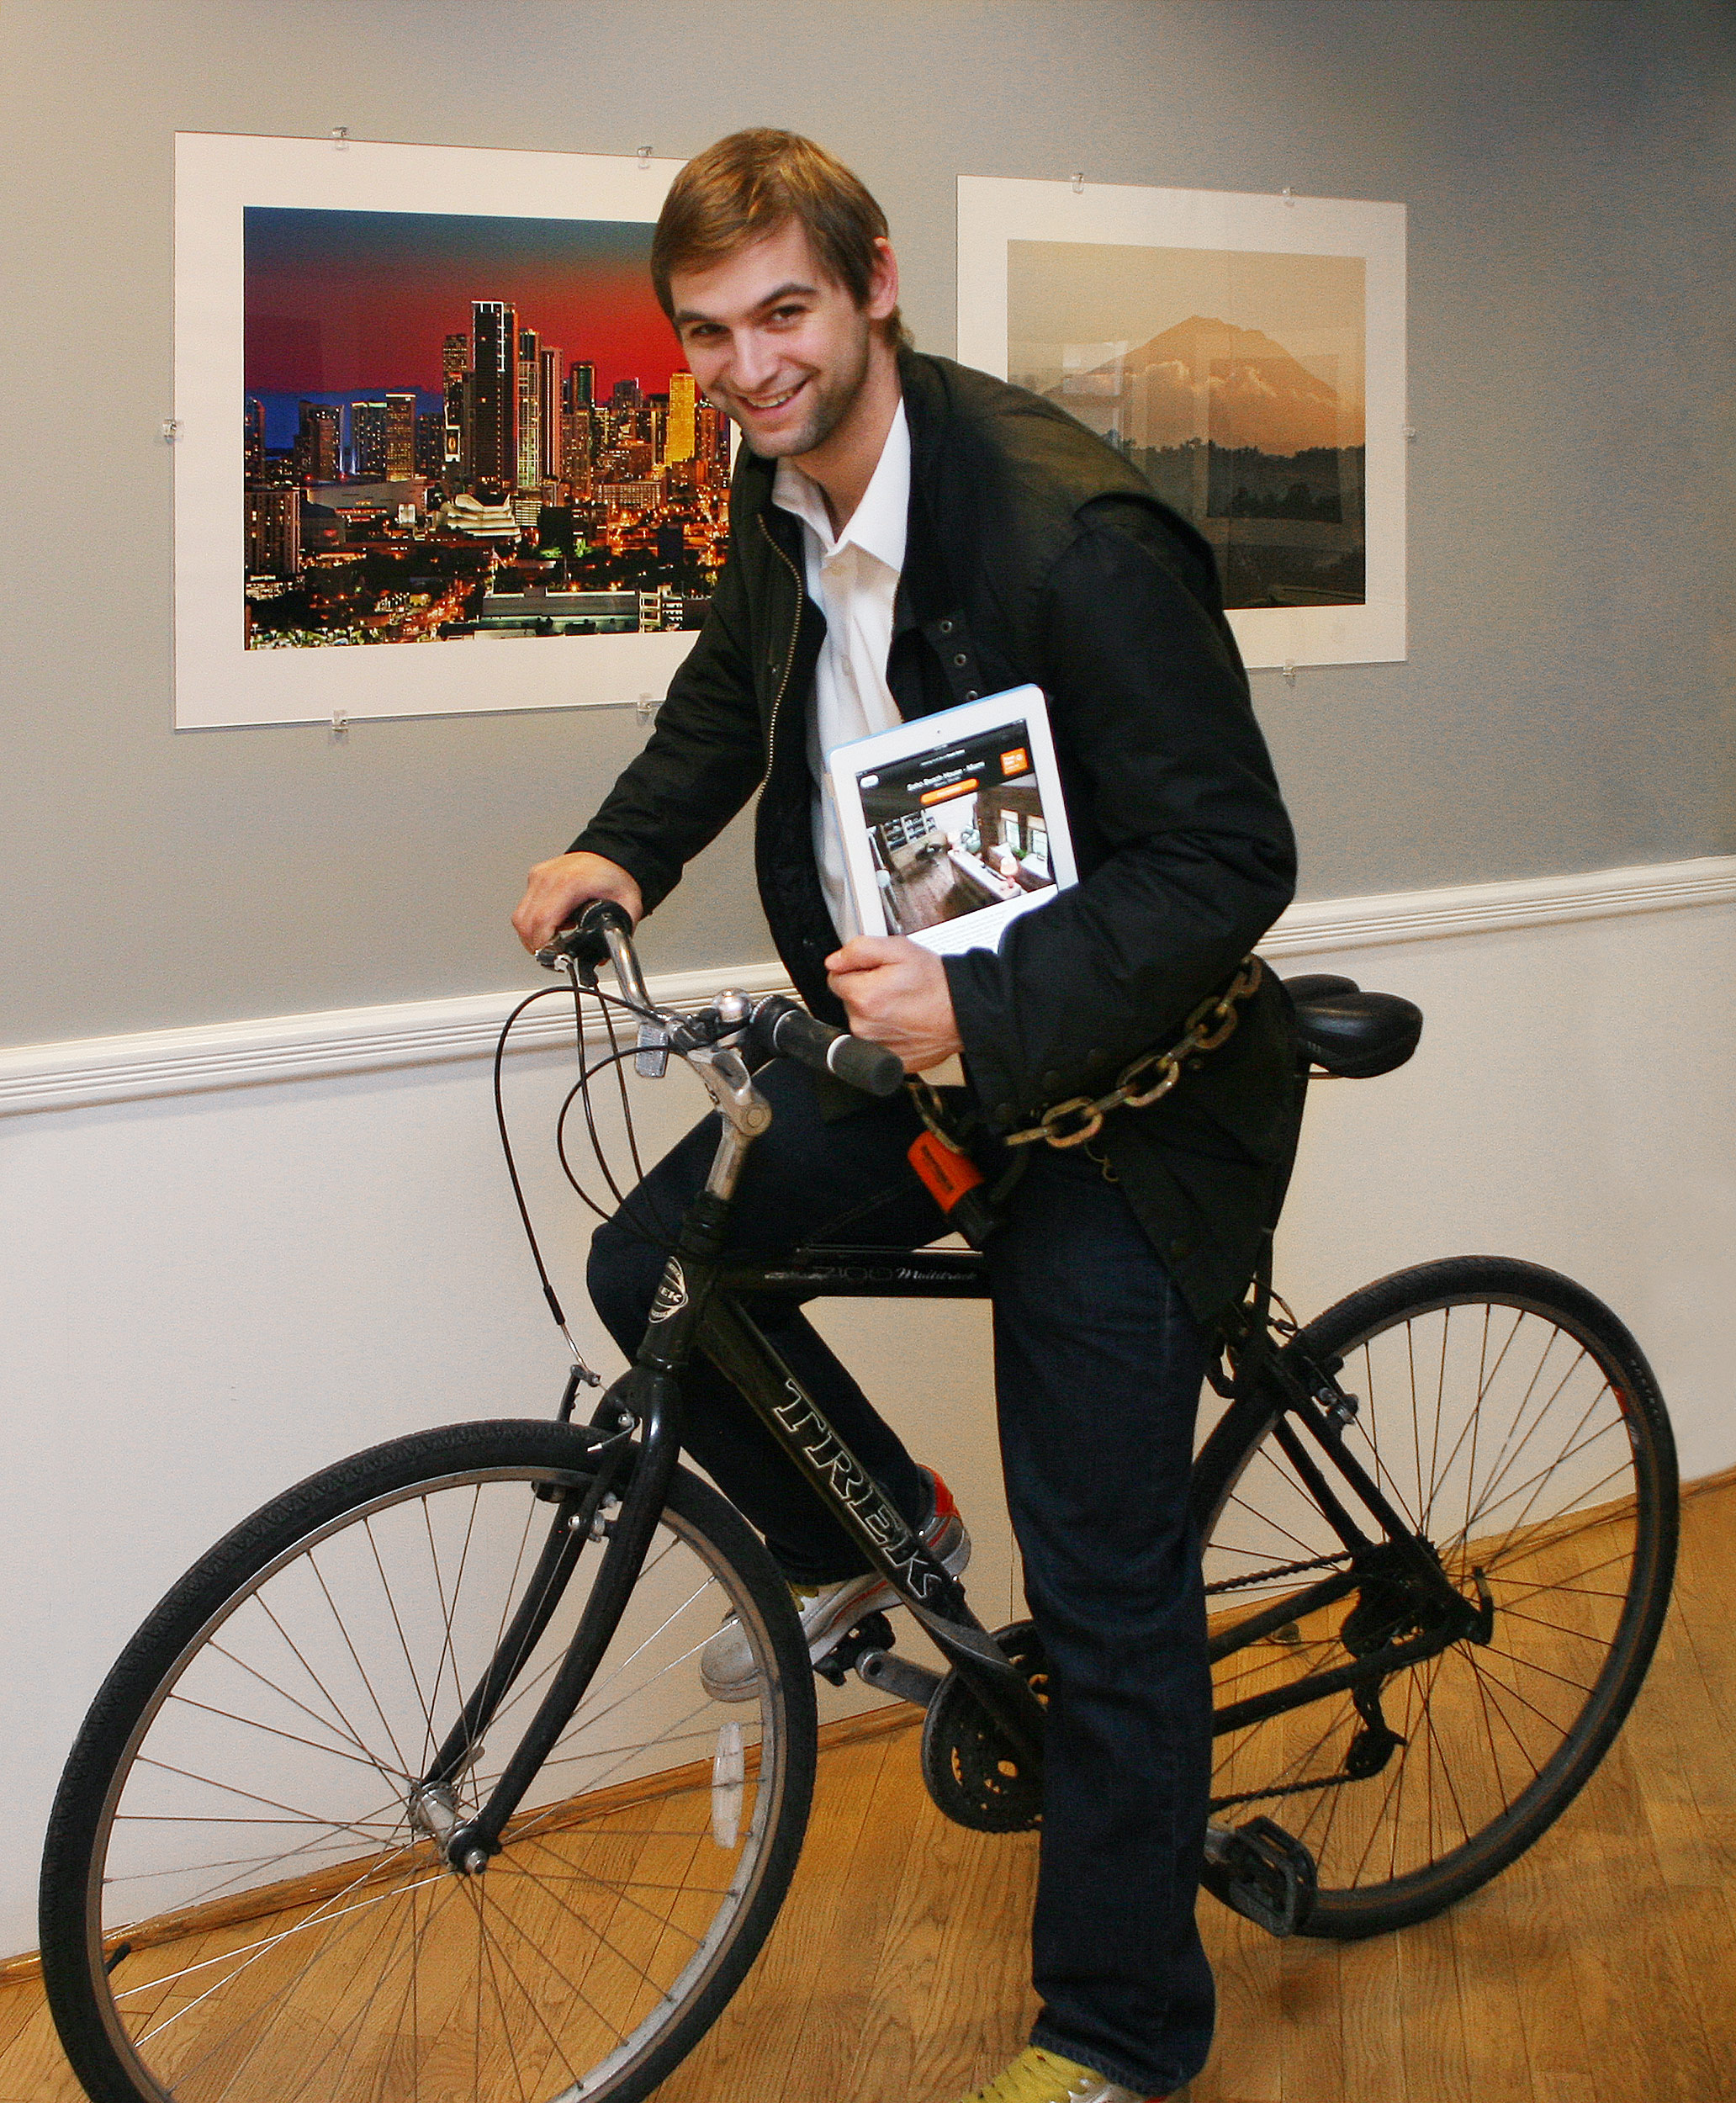 Drew_on_Bike